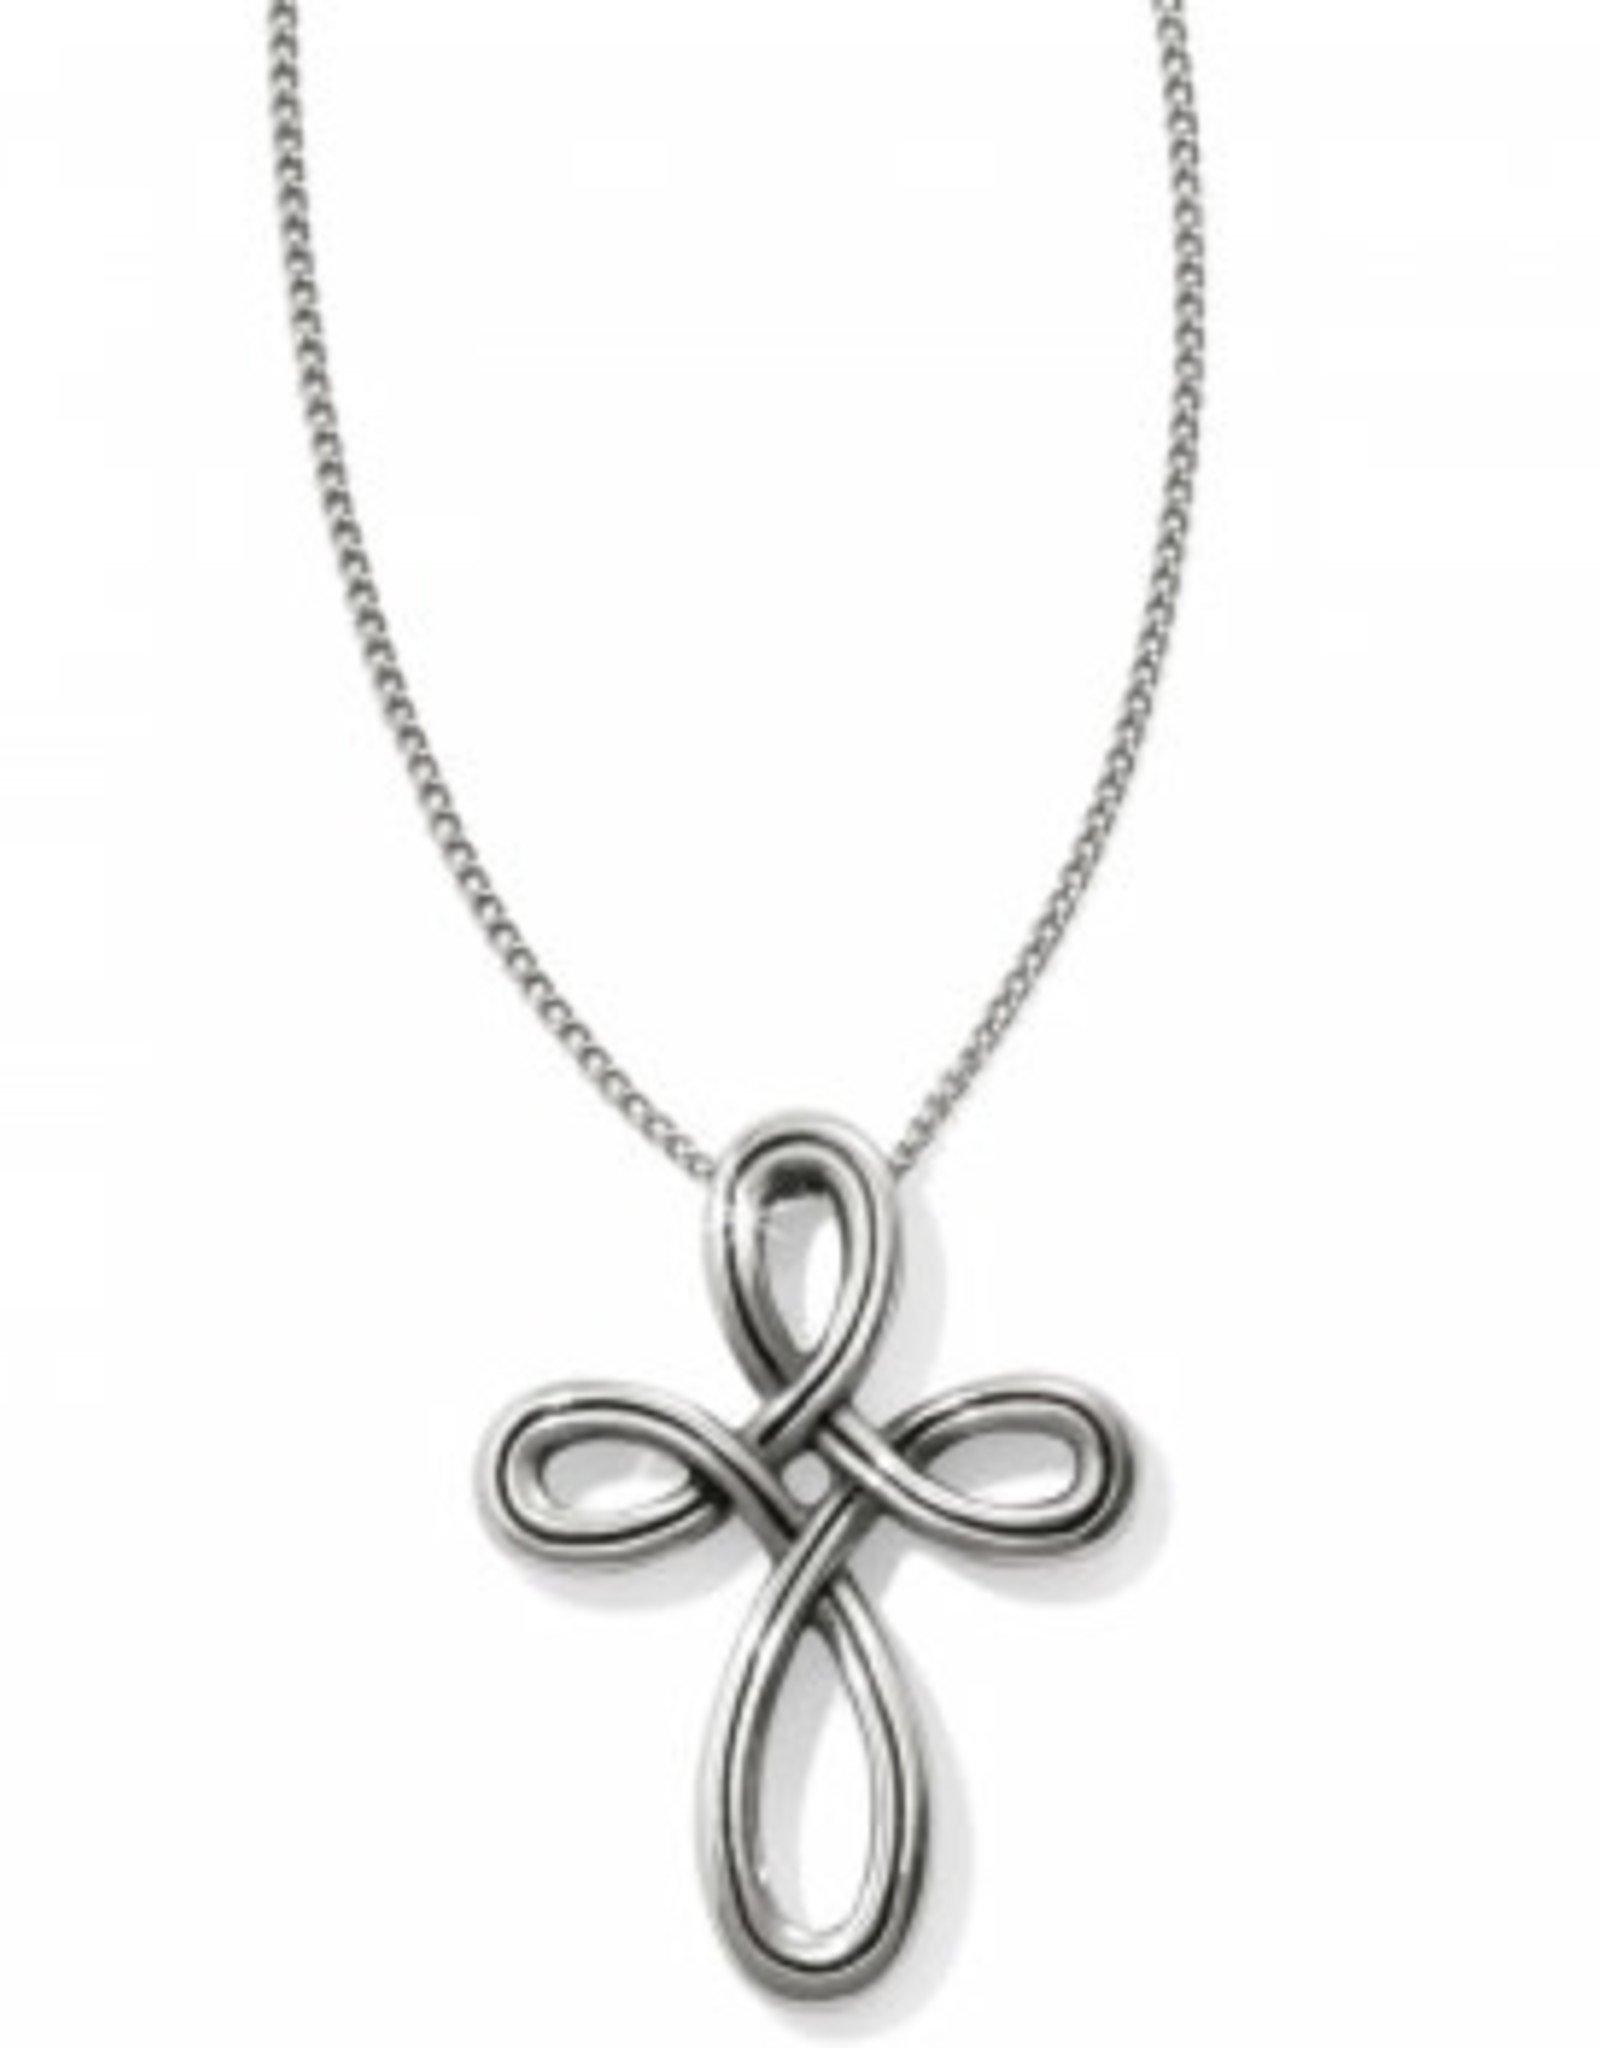 Brighton Brighton, Interlock Petite Cross Necklace